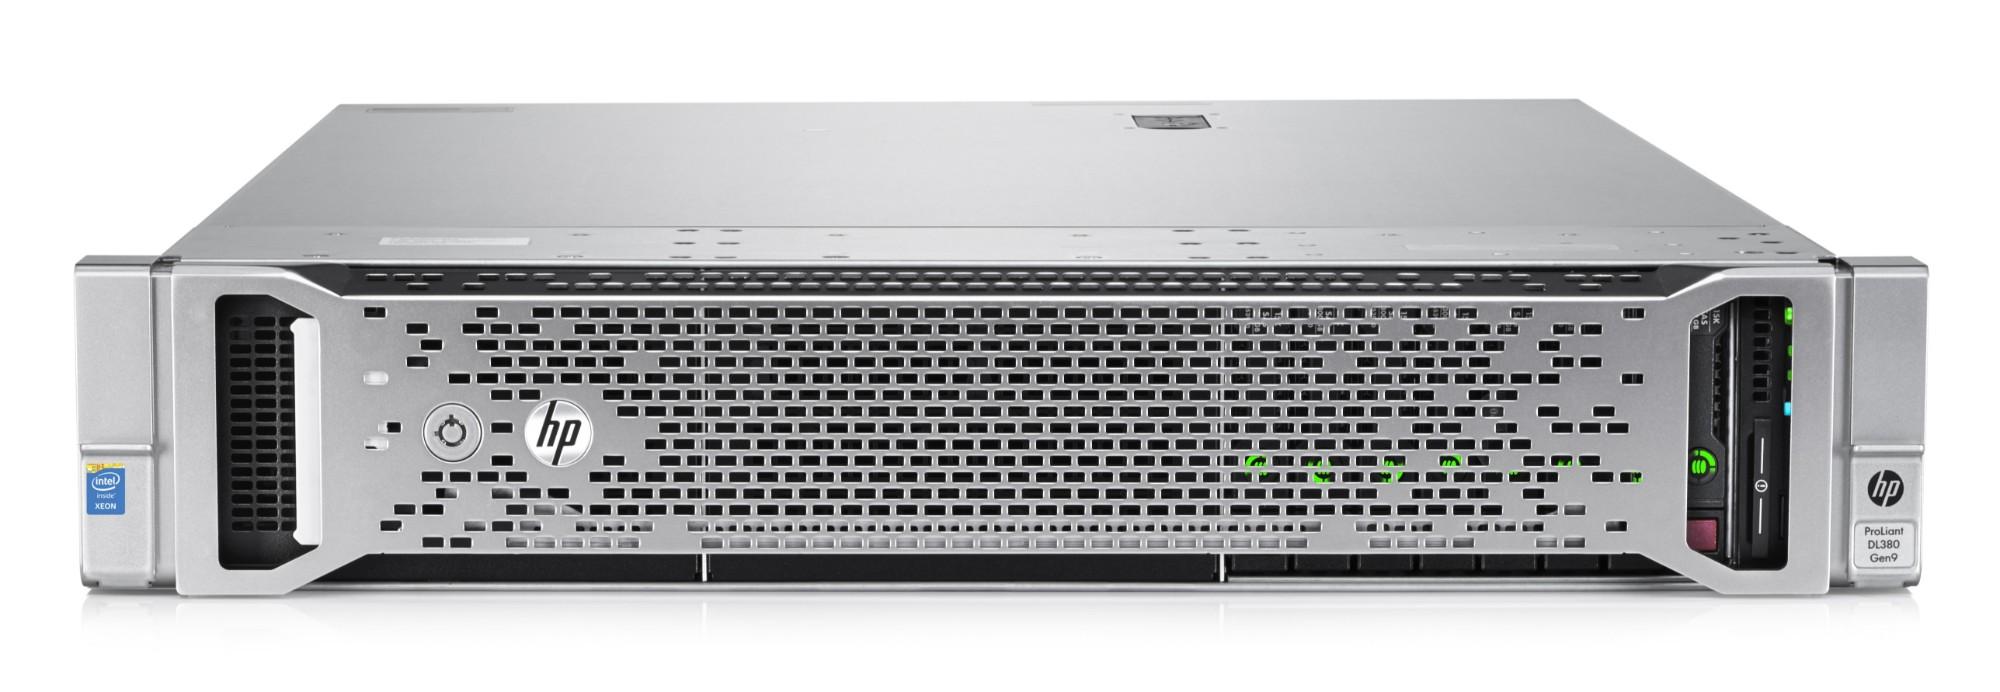 Hewlett Packard Enterprise ProLiant DL380 Gen9 2.2GHz E5-2650V4 800W Rack (2U) server